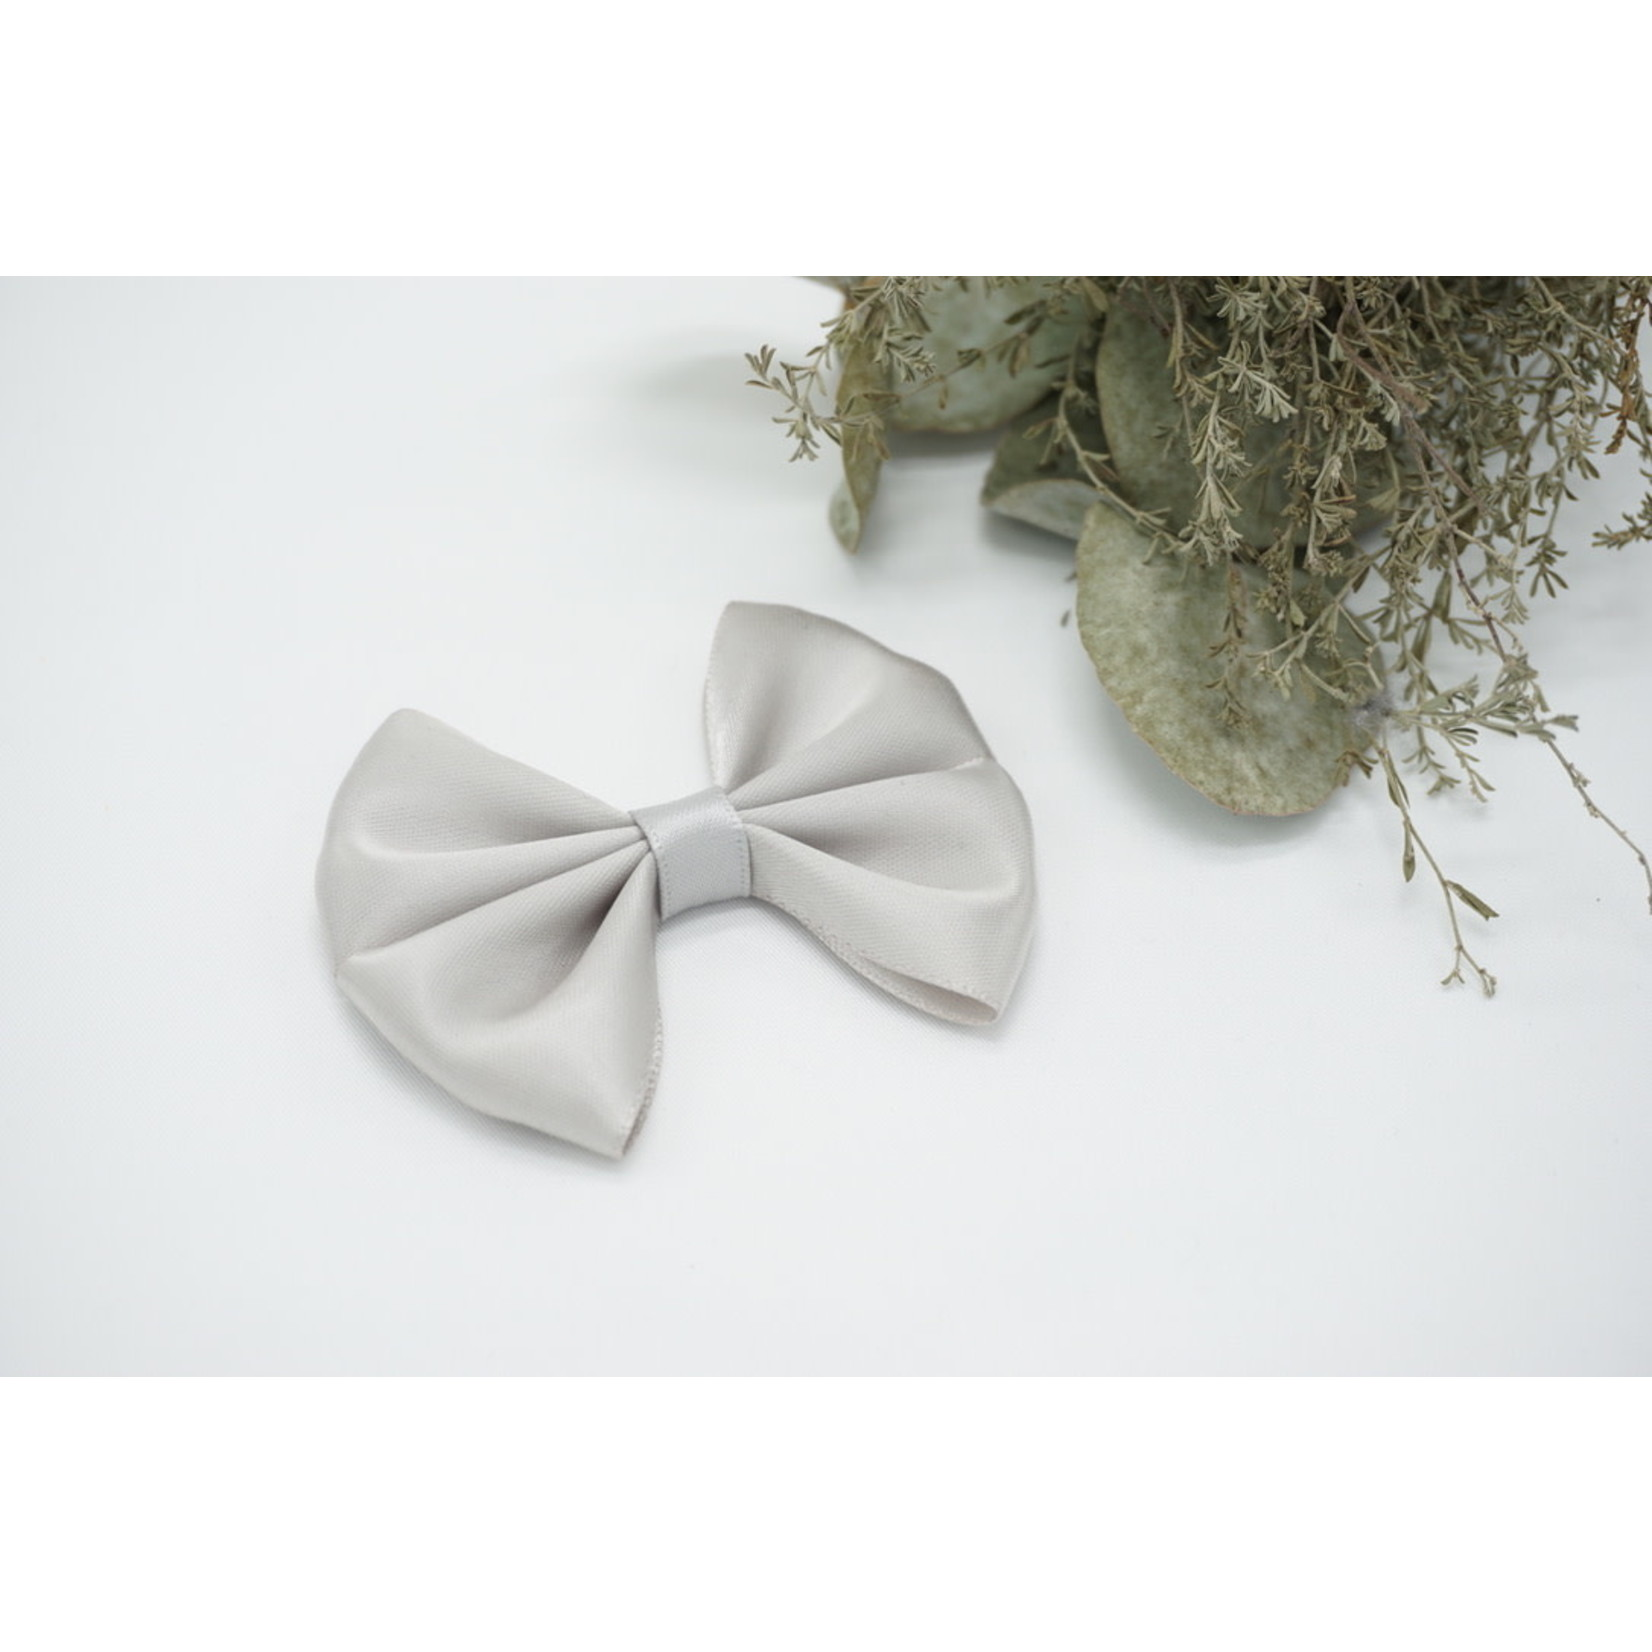 Petite Zara Satin Bow - Light Gray